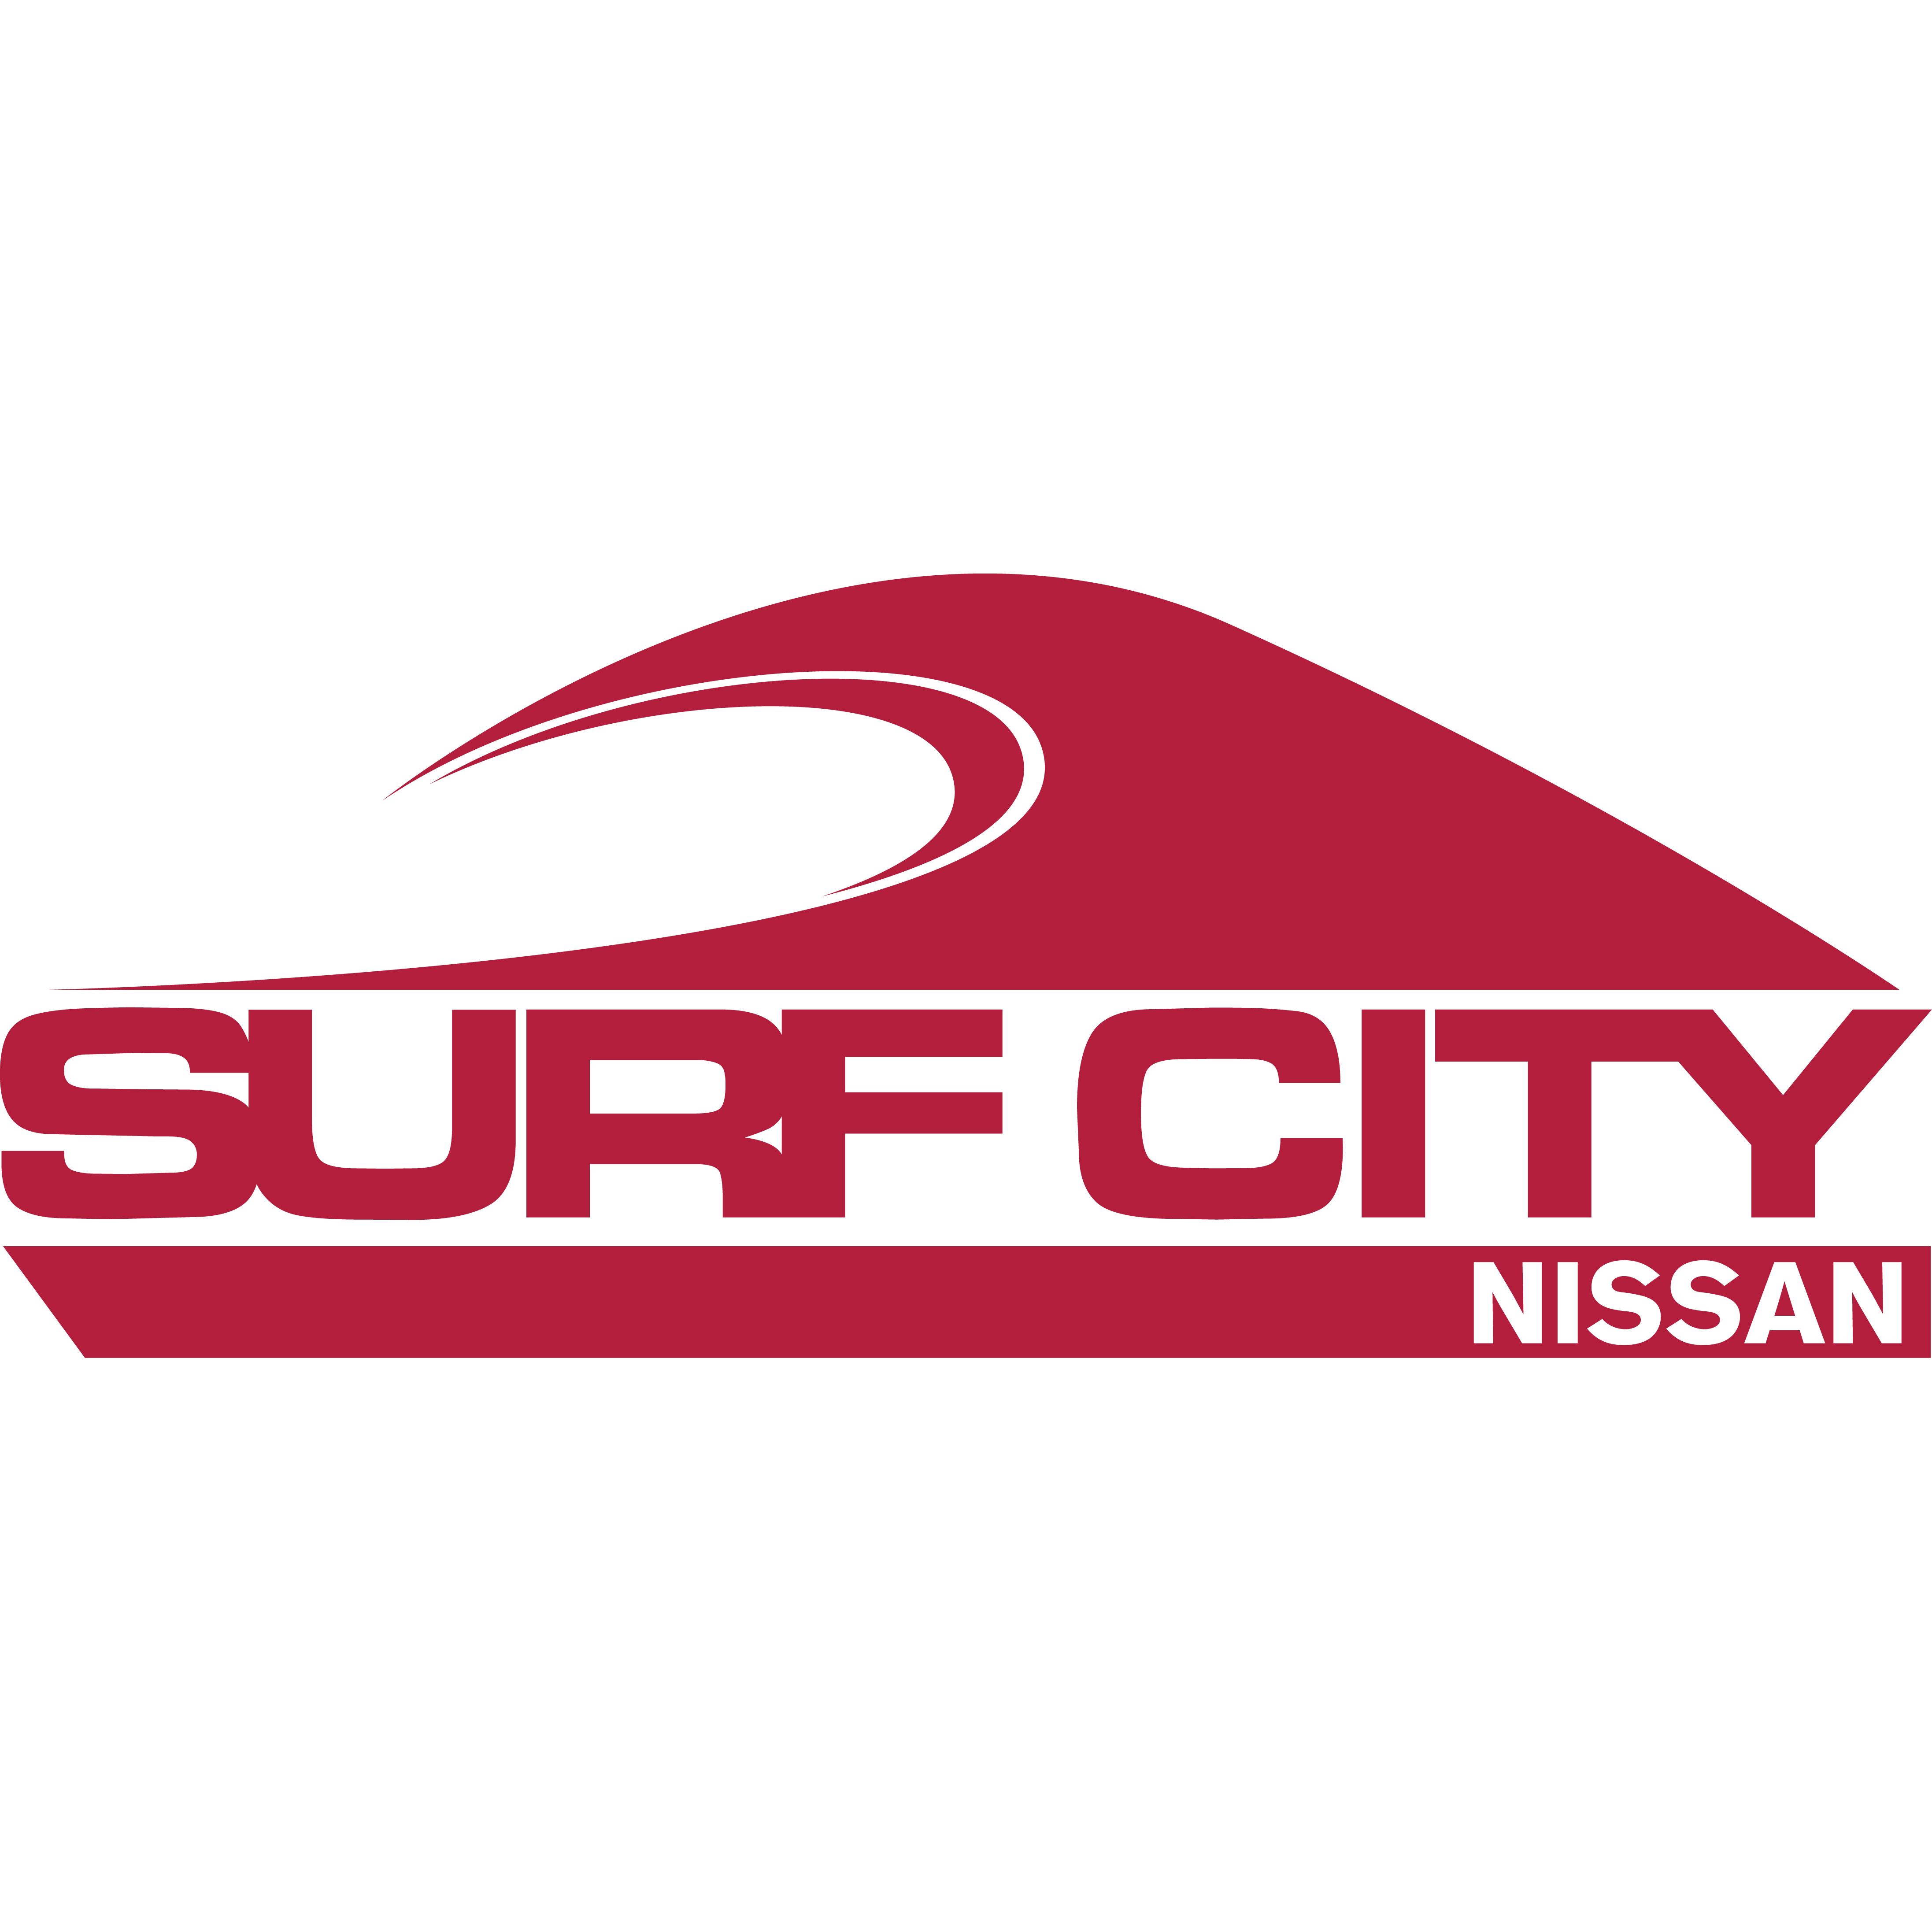 Surf City Nissan